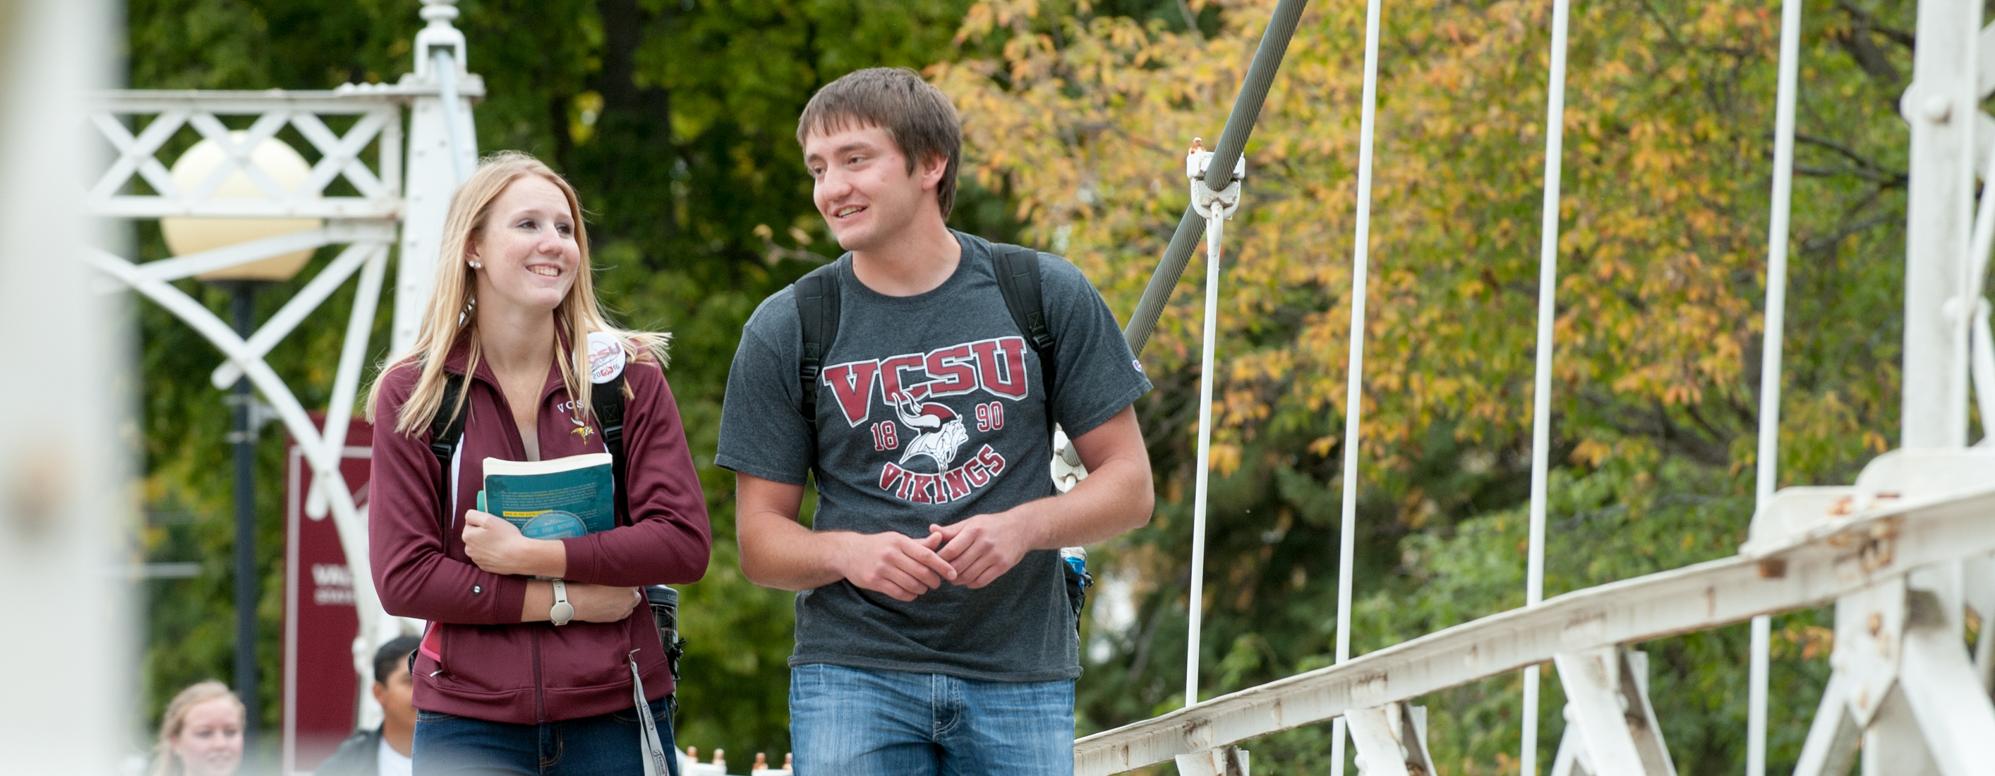 VCSU is U.S. News Best College